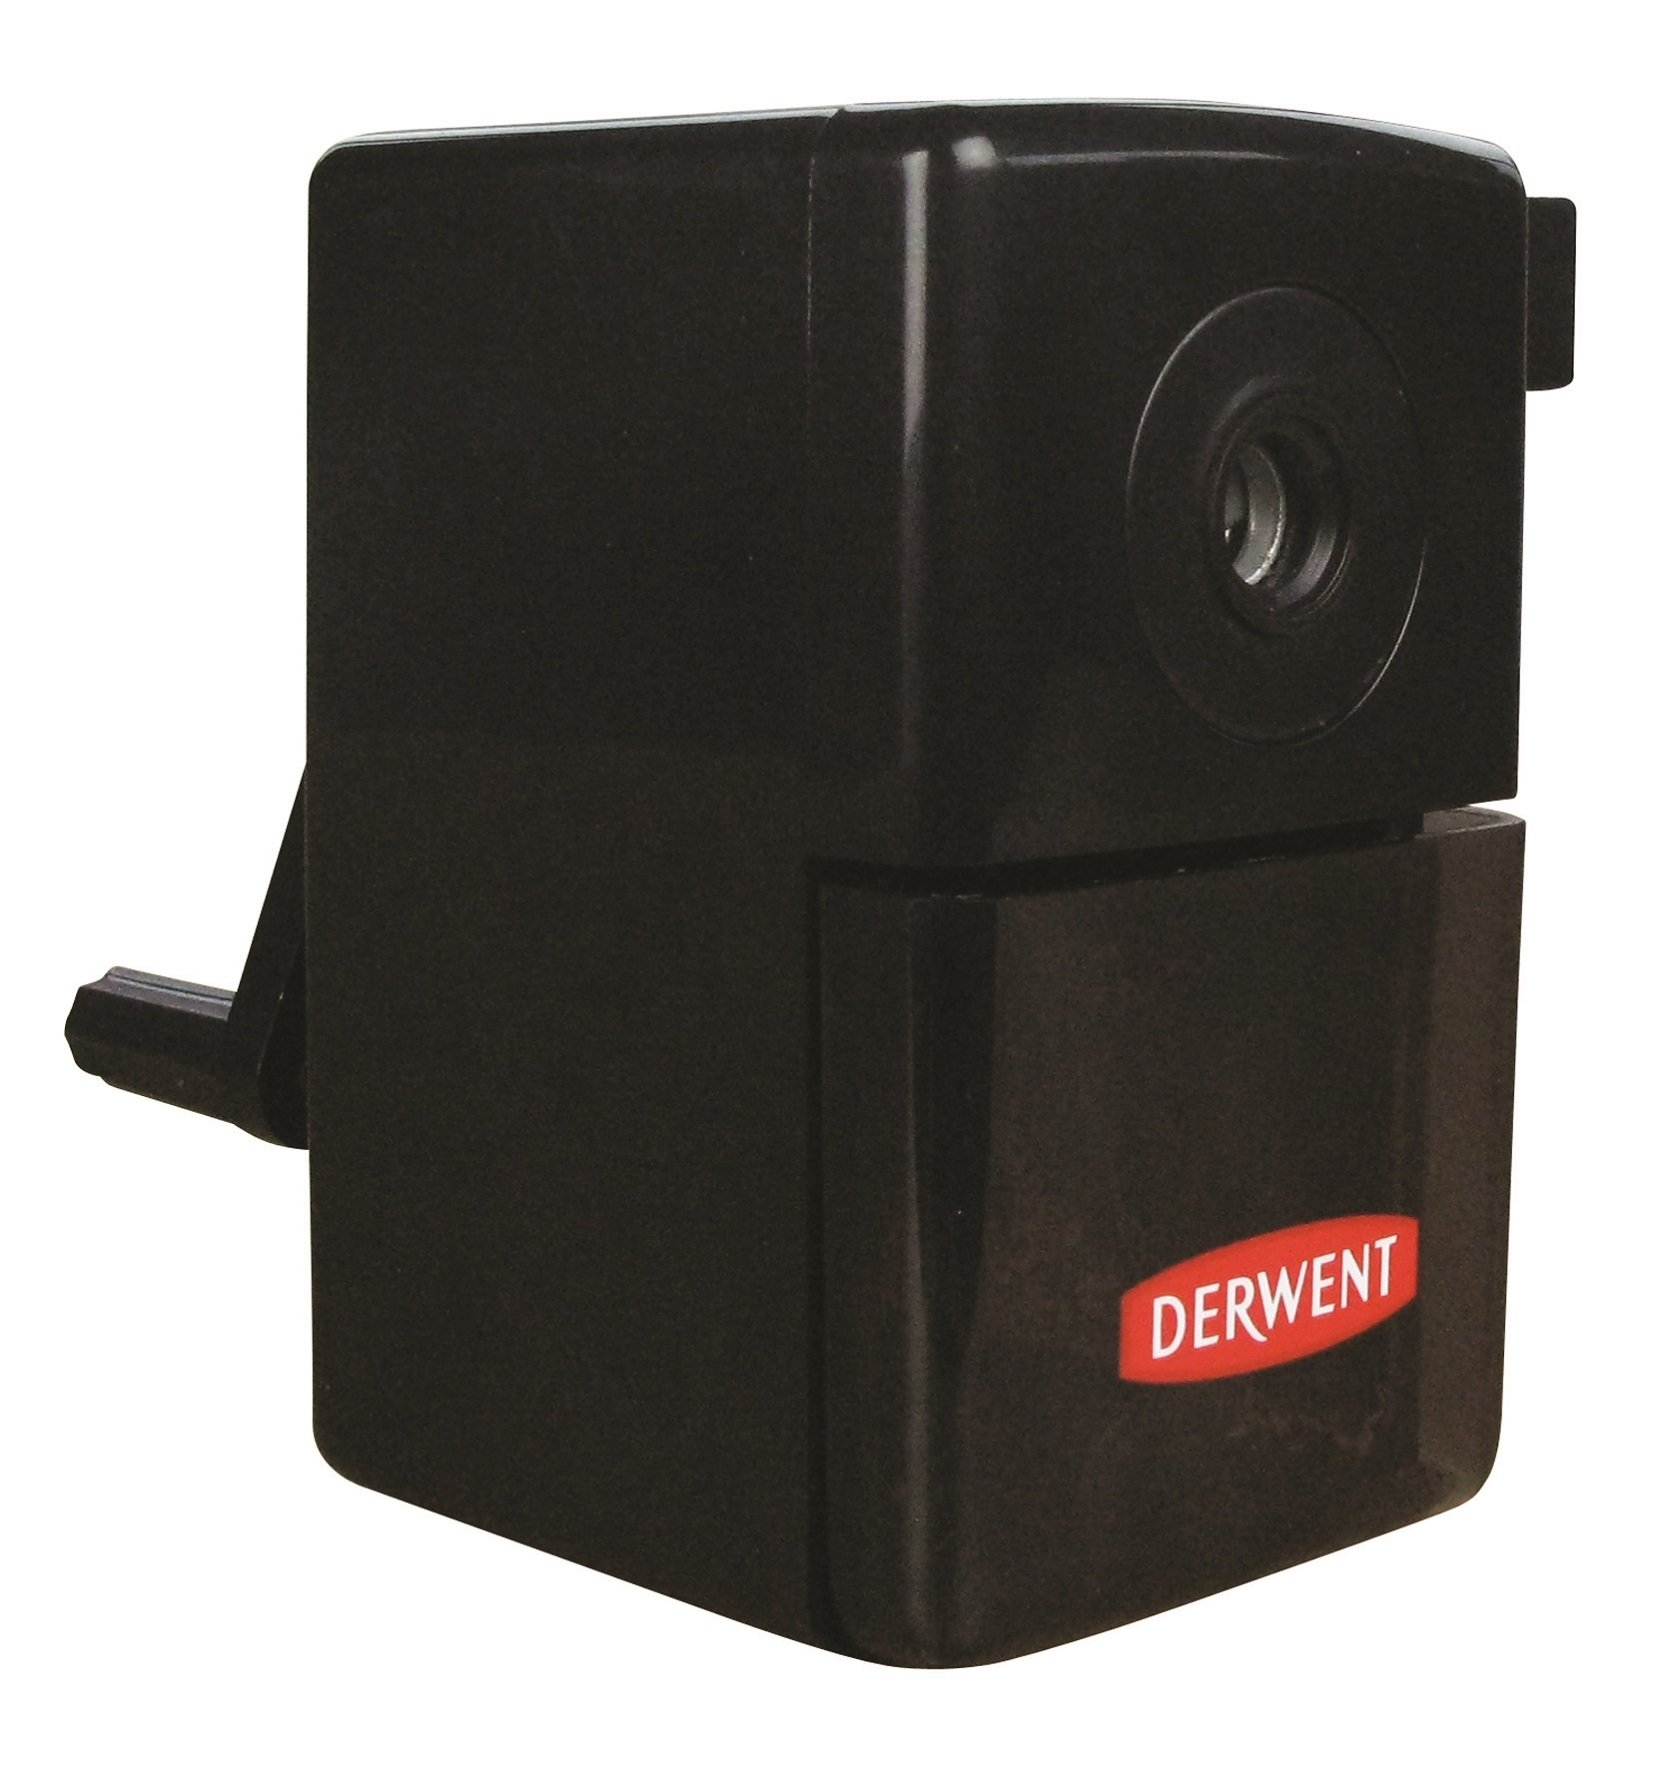 Derwent Super Point Mini Manual Pencil Sharpener (2302000)